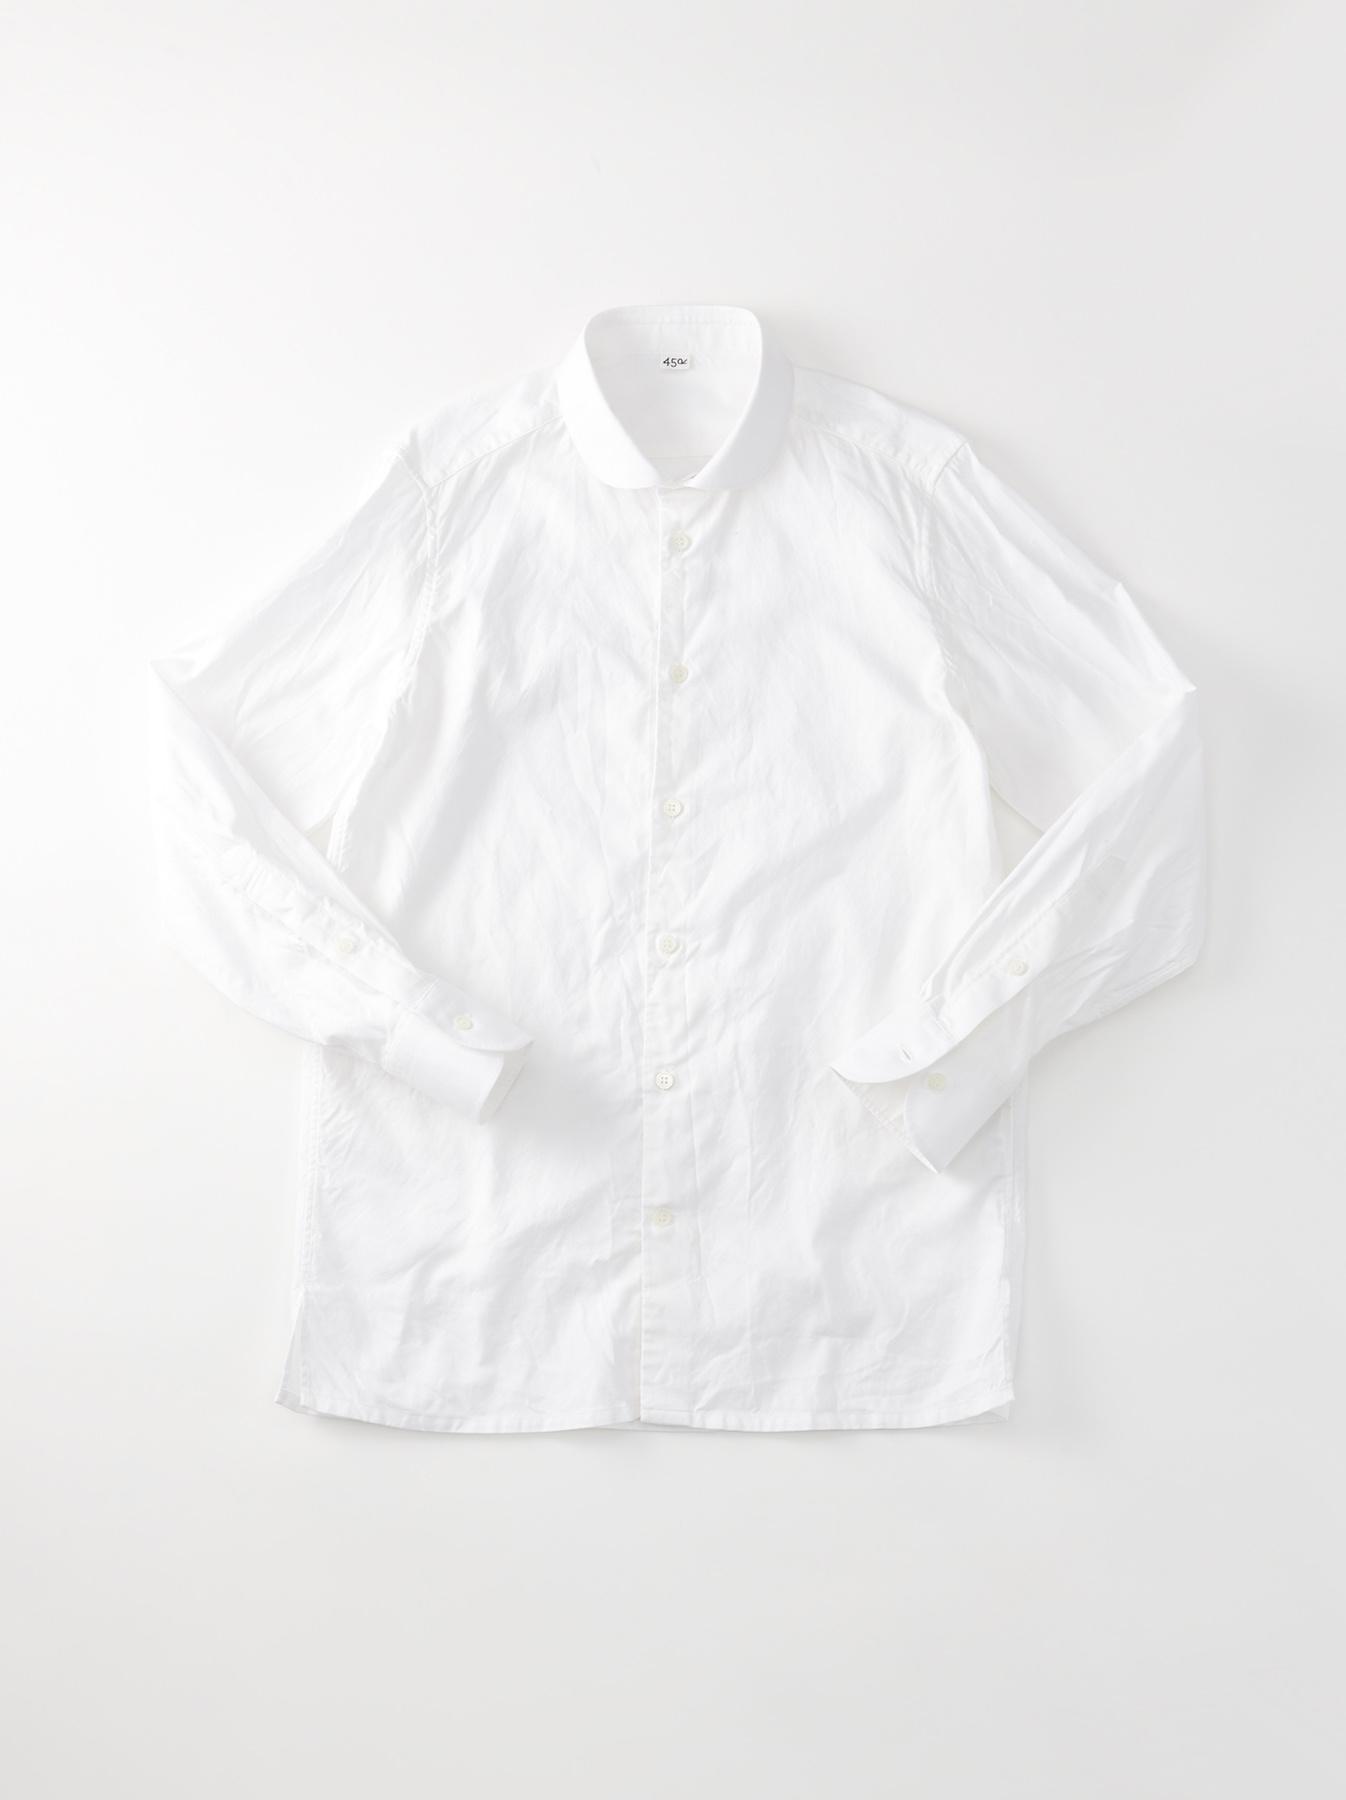 WH Oxford 908 Round Collar Shirt-1